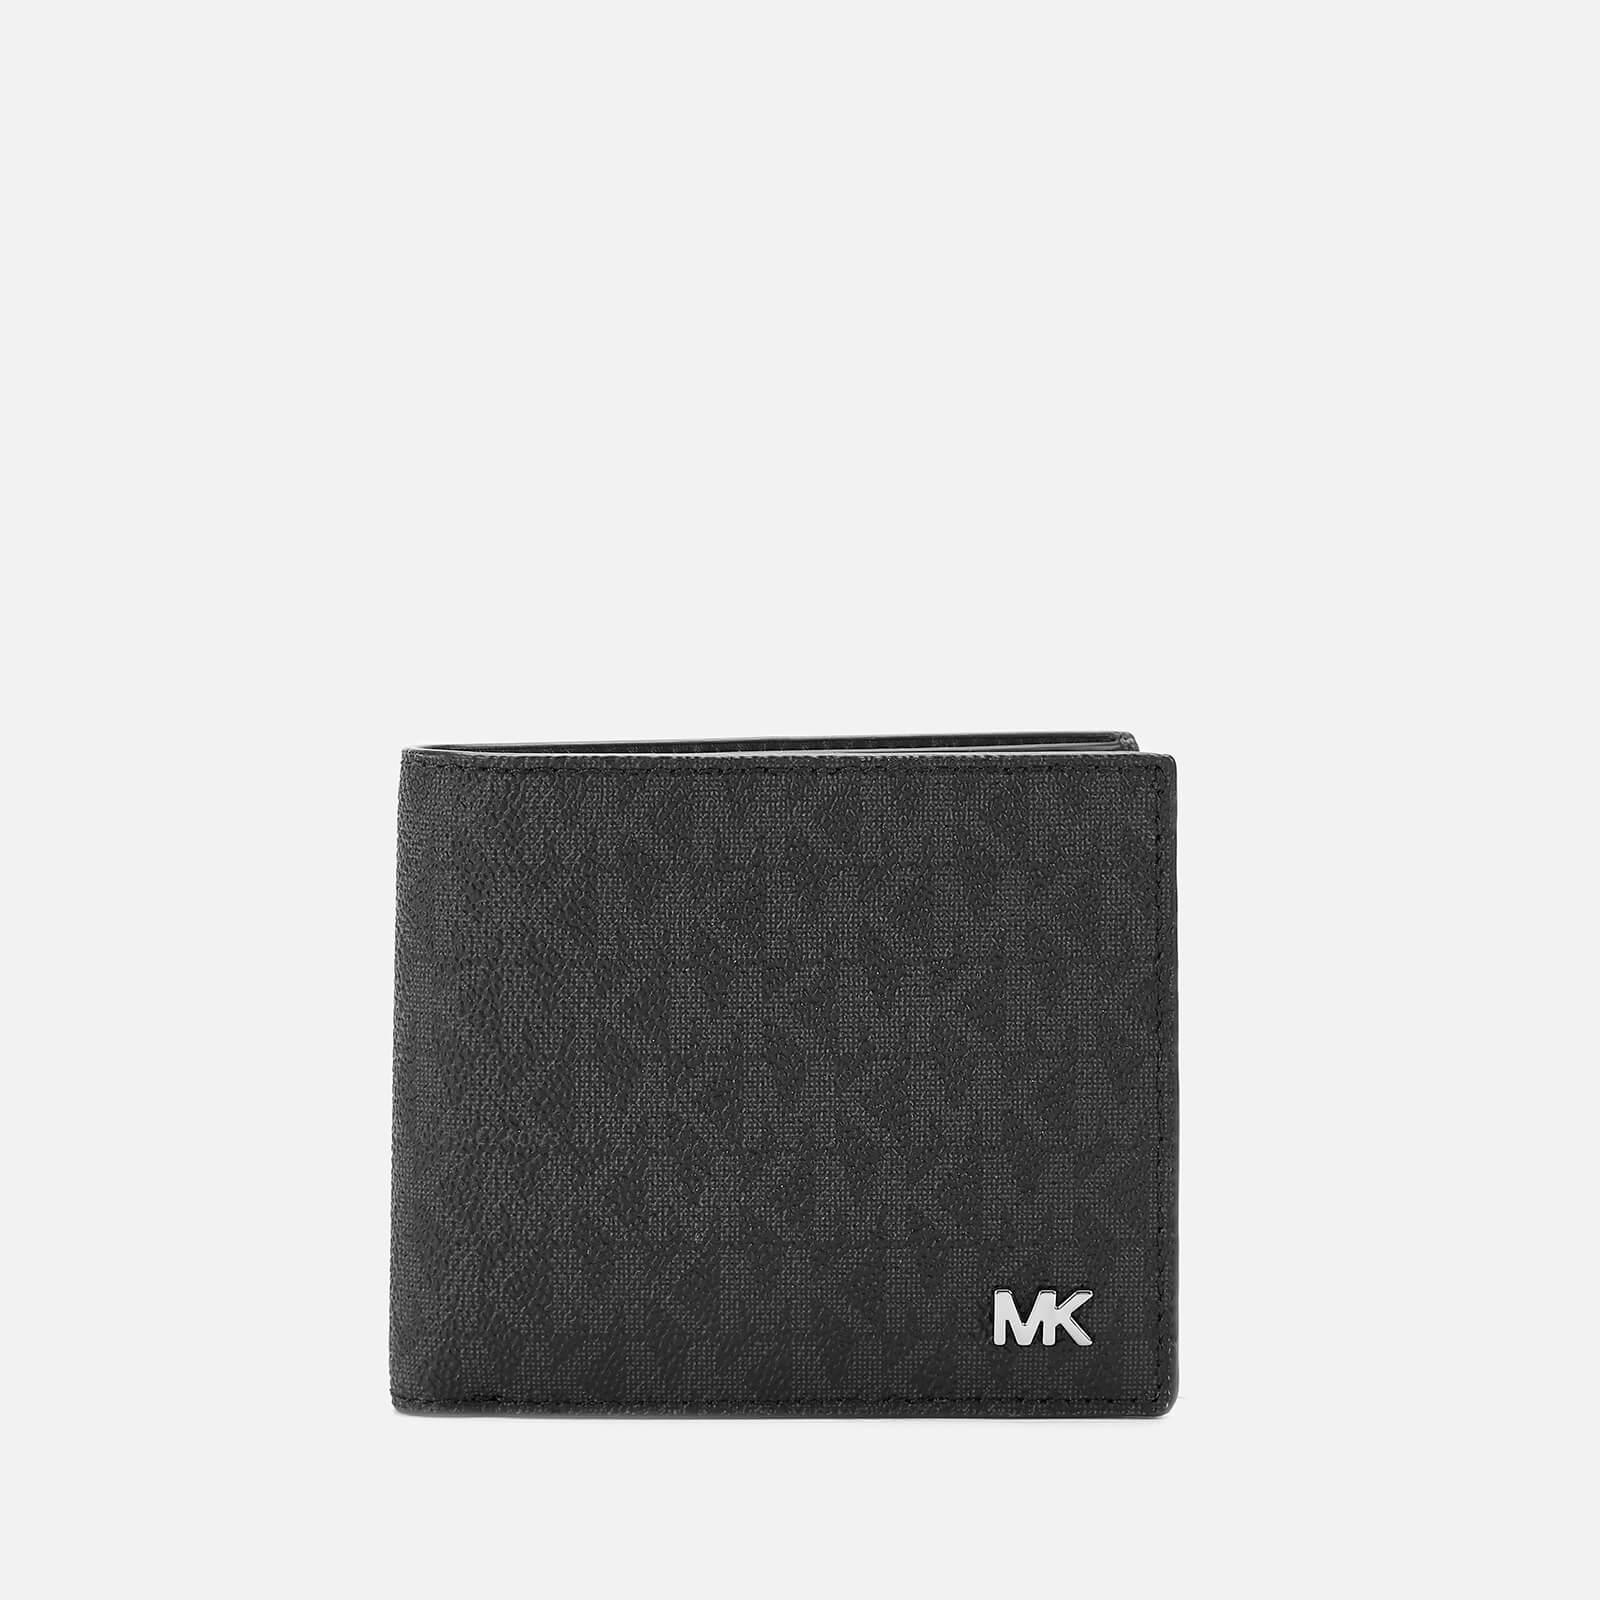 1c9df495e21d Michael Kors Men s Jet Set Billfold Wallet - Black Mens Accessories ...